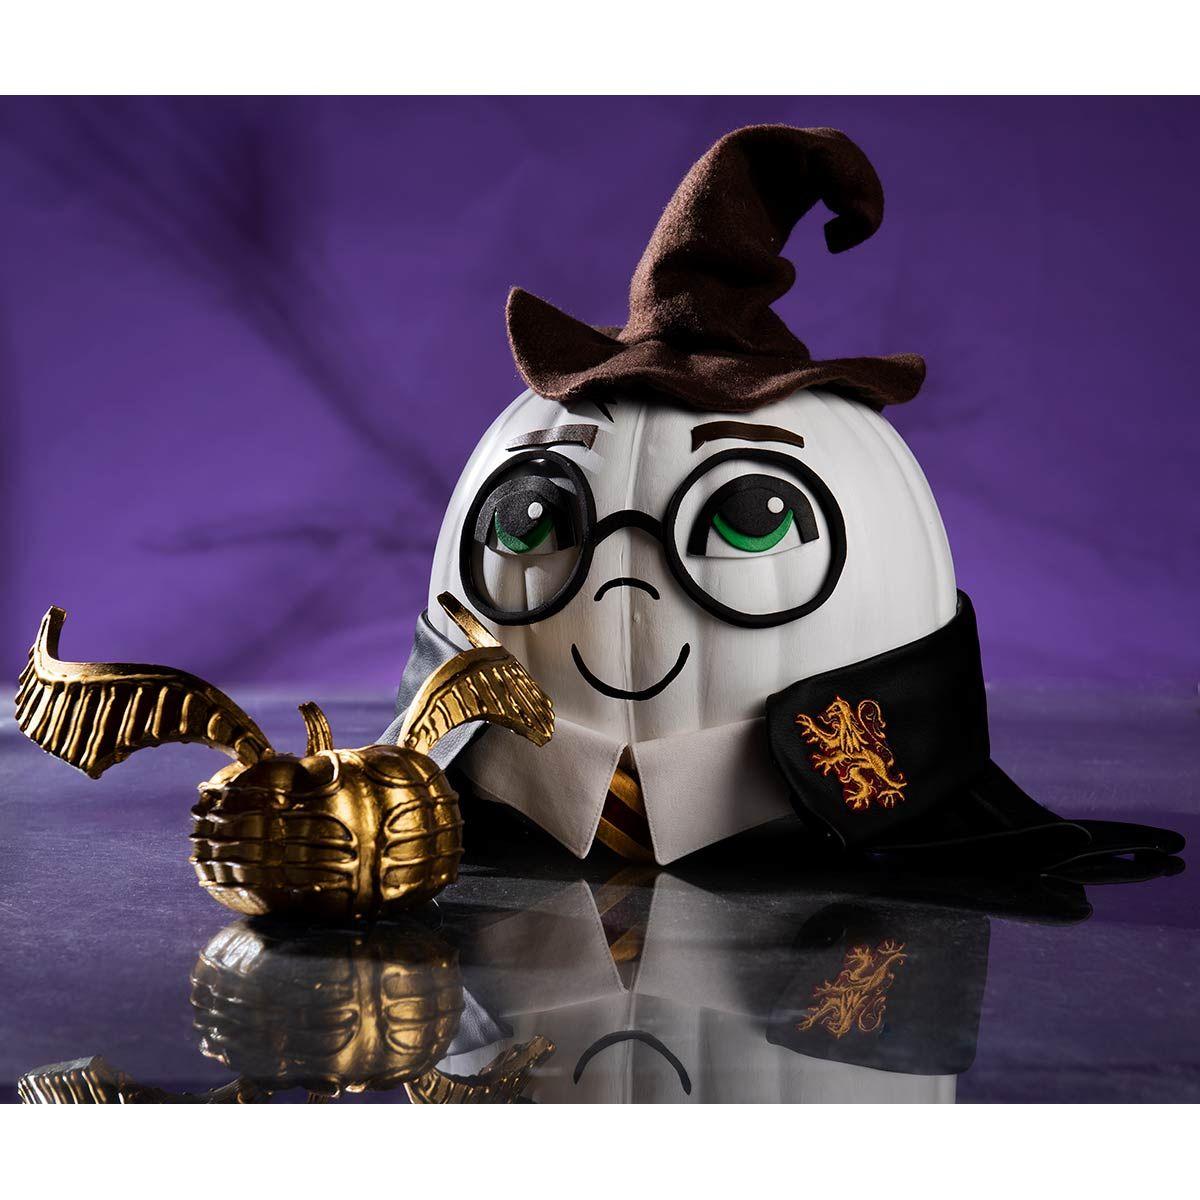 Halloween Crafts And Treats.900 Halloween Crafts Treats Ideas Halloween Crafts Halloween Craft Treats Crafts